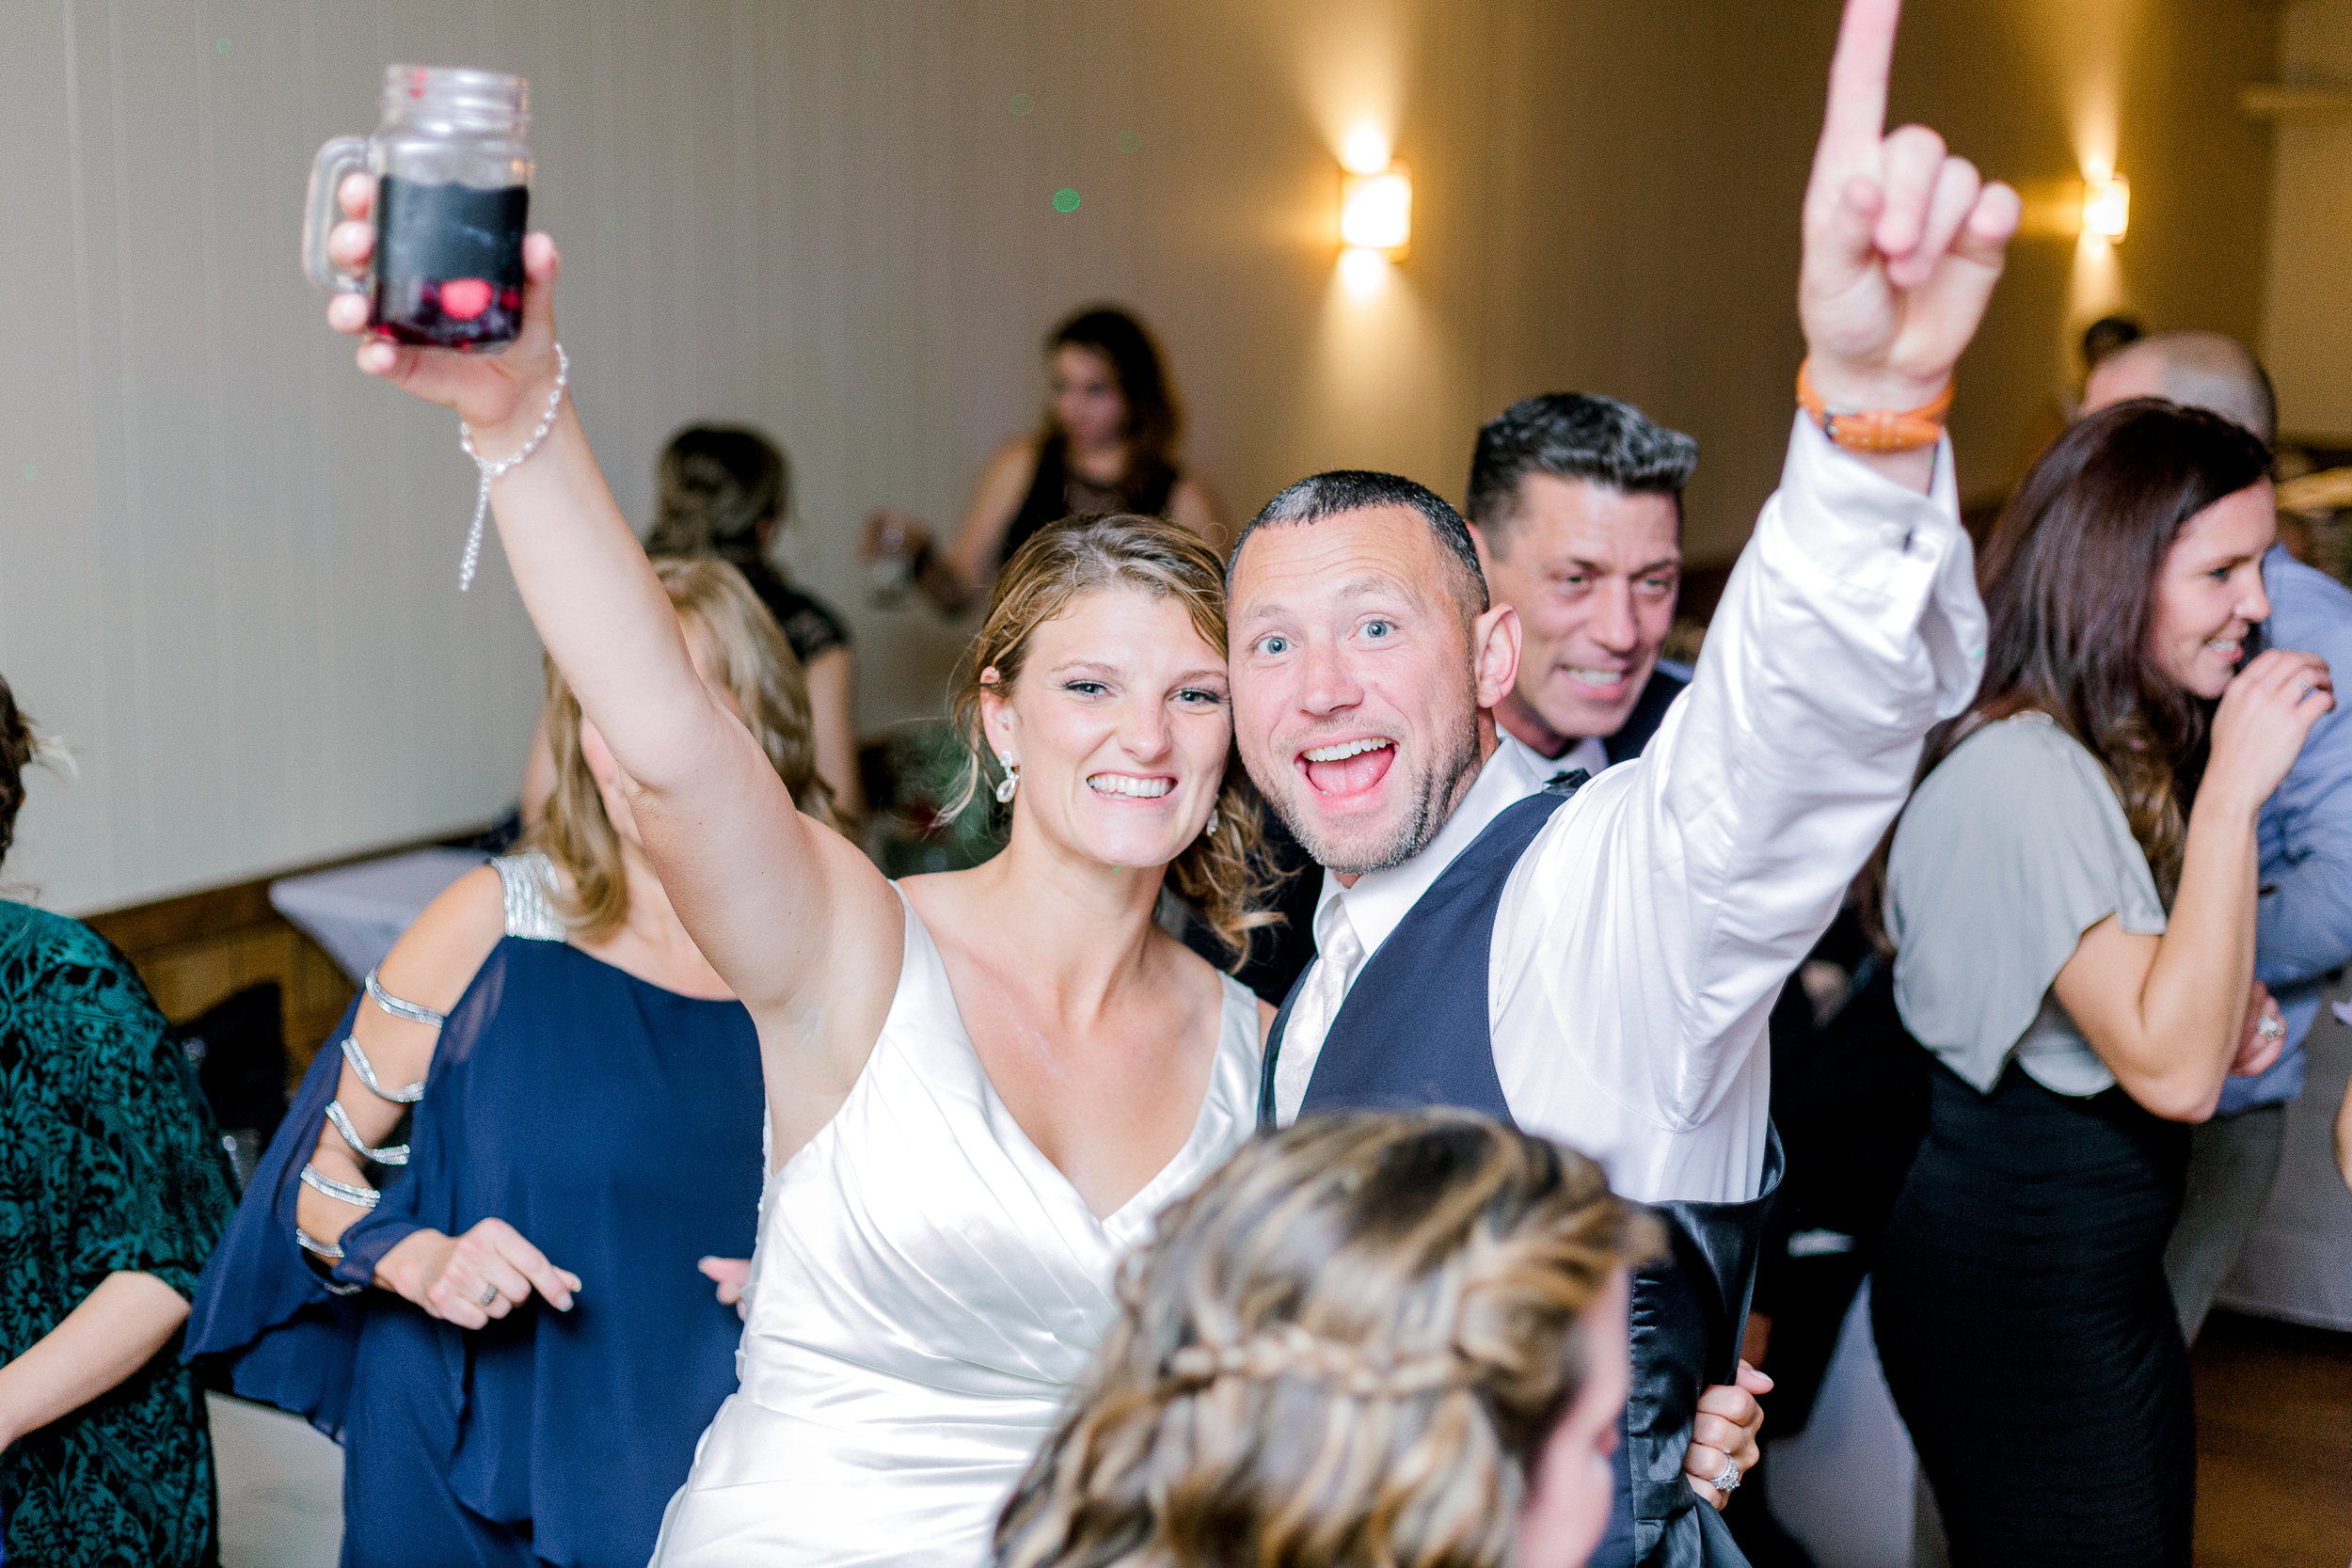 Pennsylvania October Fall Lehigh Valley wedding and lifestyle photographer Lytle Photo Co (166 of 167).jpg